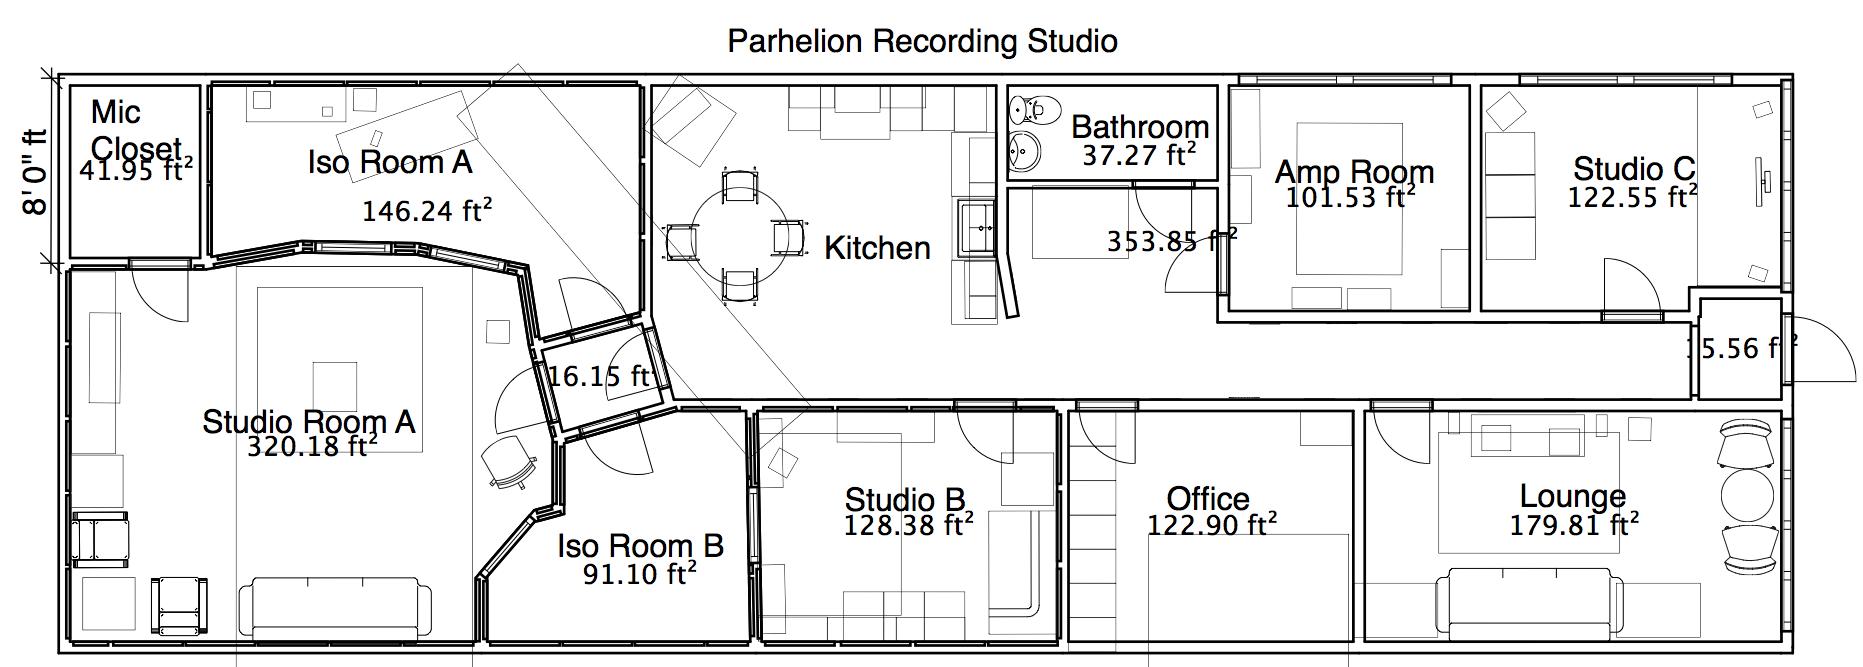 Studio Layout | Parhelion Recording Studio Atlanta